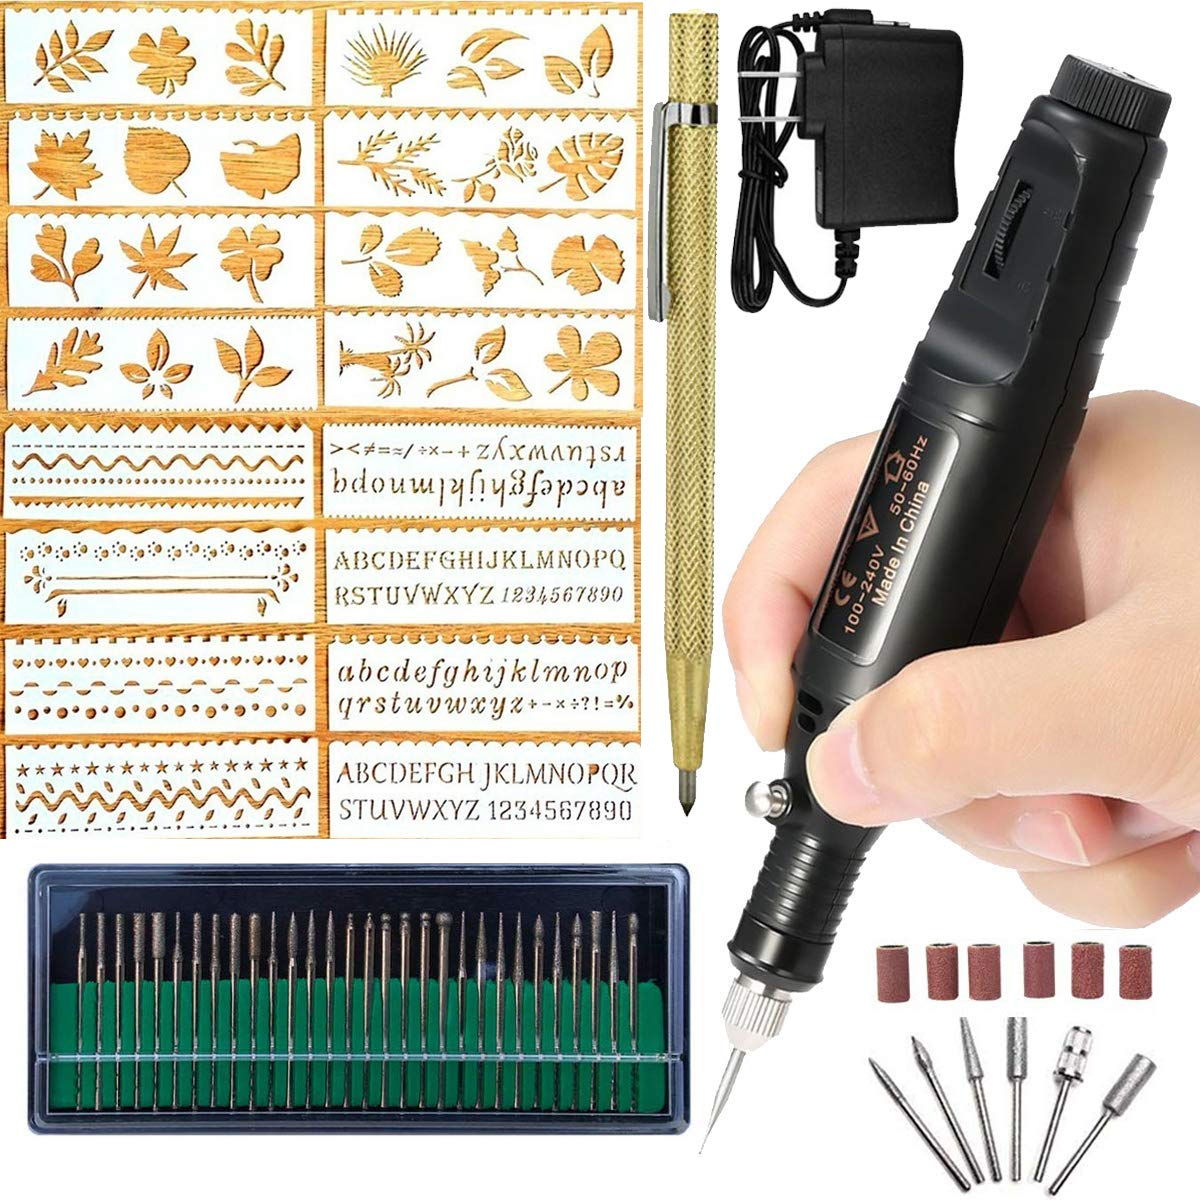 Arts, Crafts & Sewing Engraving Machines & Tools ghdonat.com ...